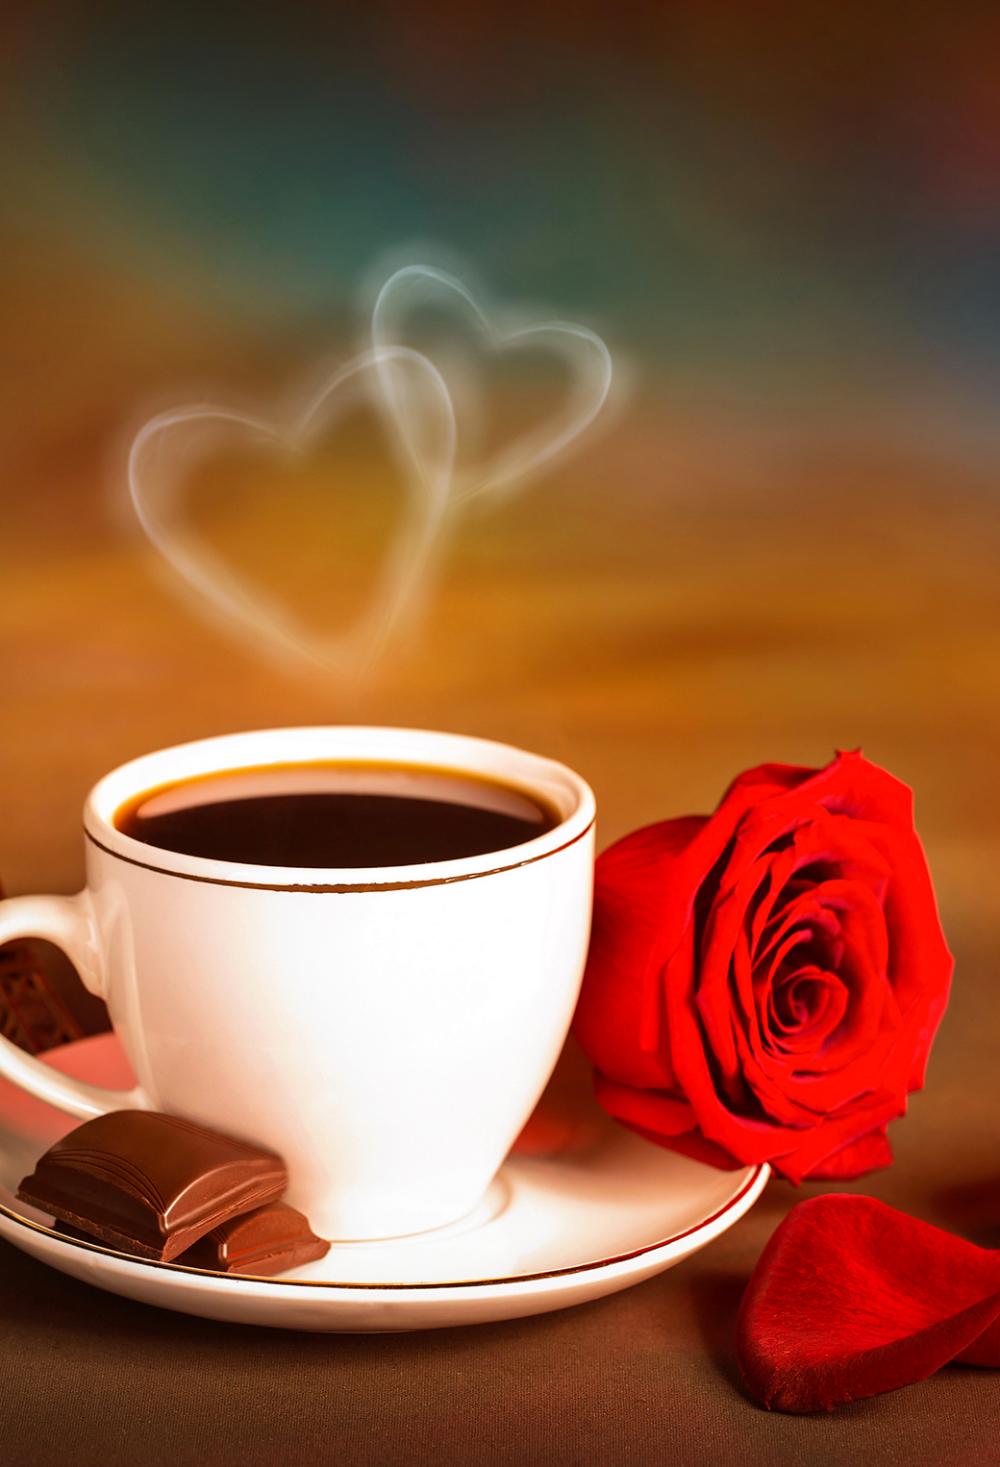 Beskrajne mudrosti - Pinterest in 2020 | Coffee wallpaper ...